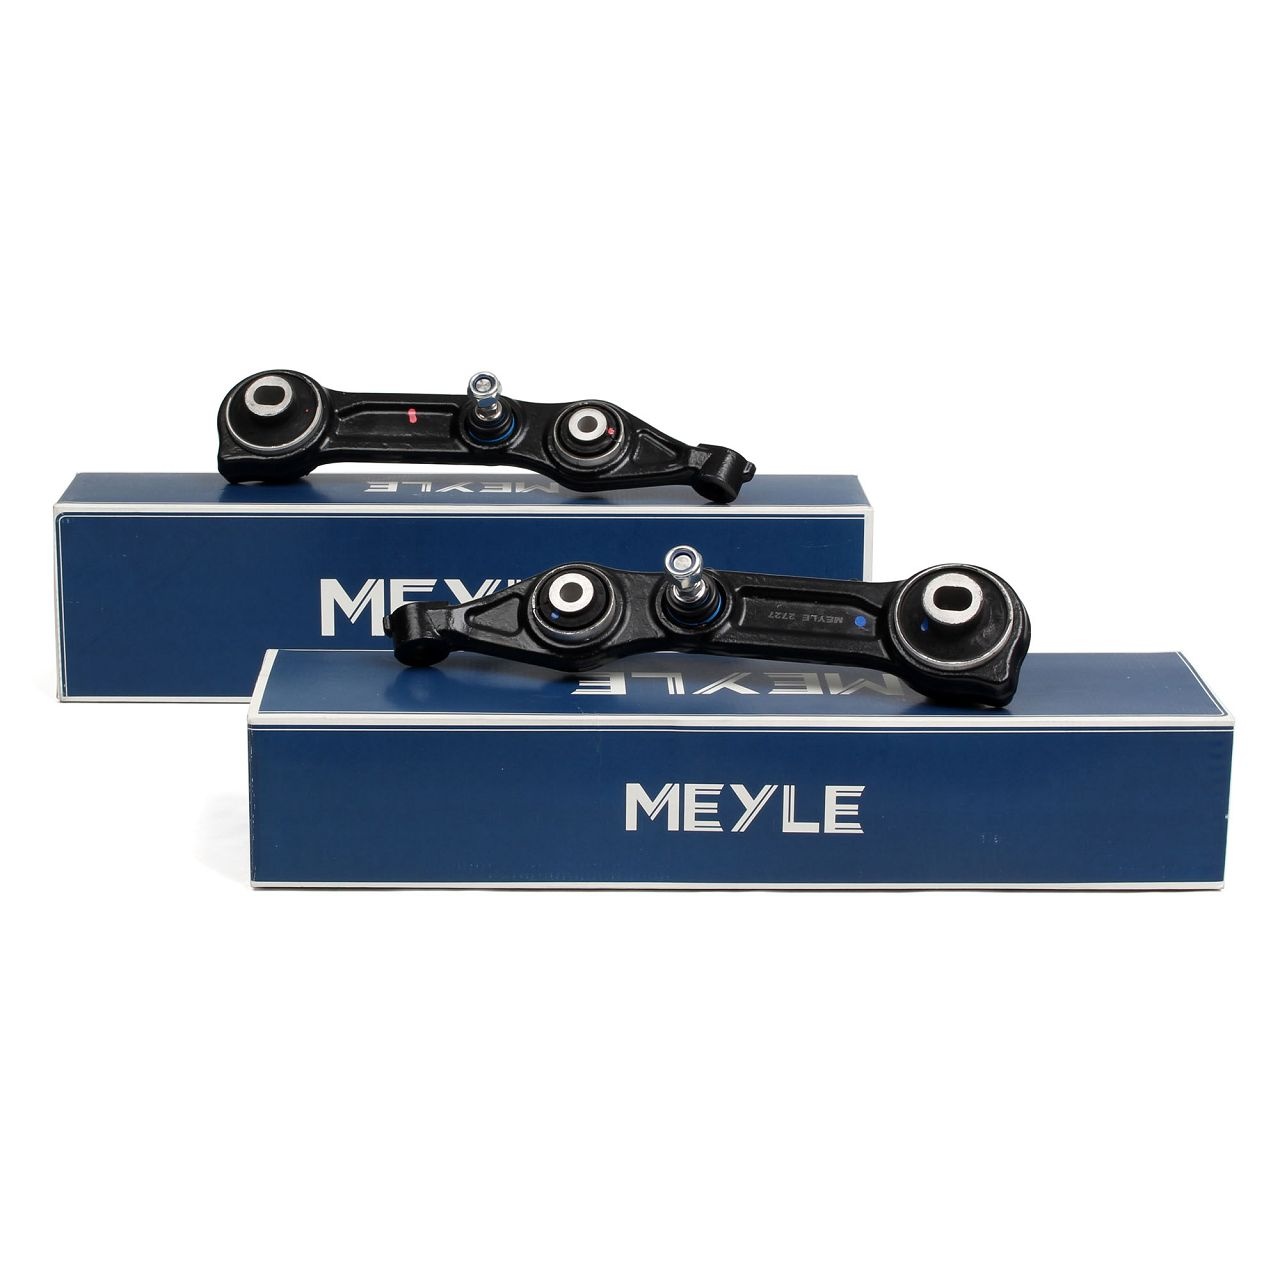 2x MEYLE Querlenker + Traggelenk MERCEDES C219 W211 Vorderachse unten hinten